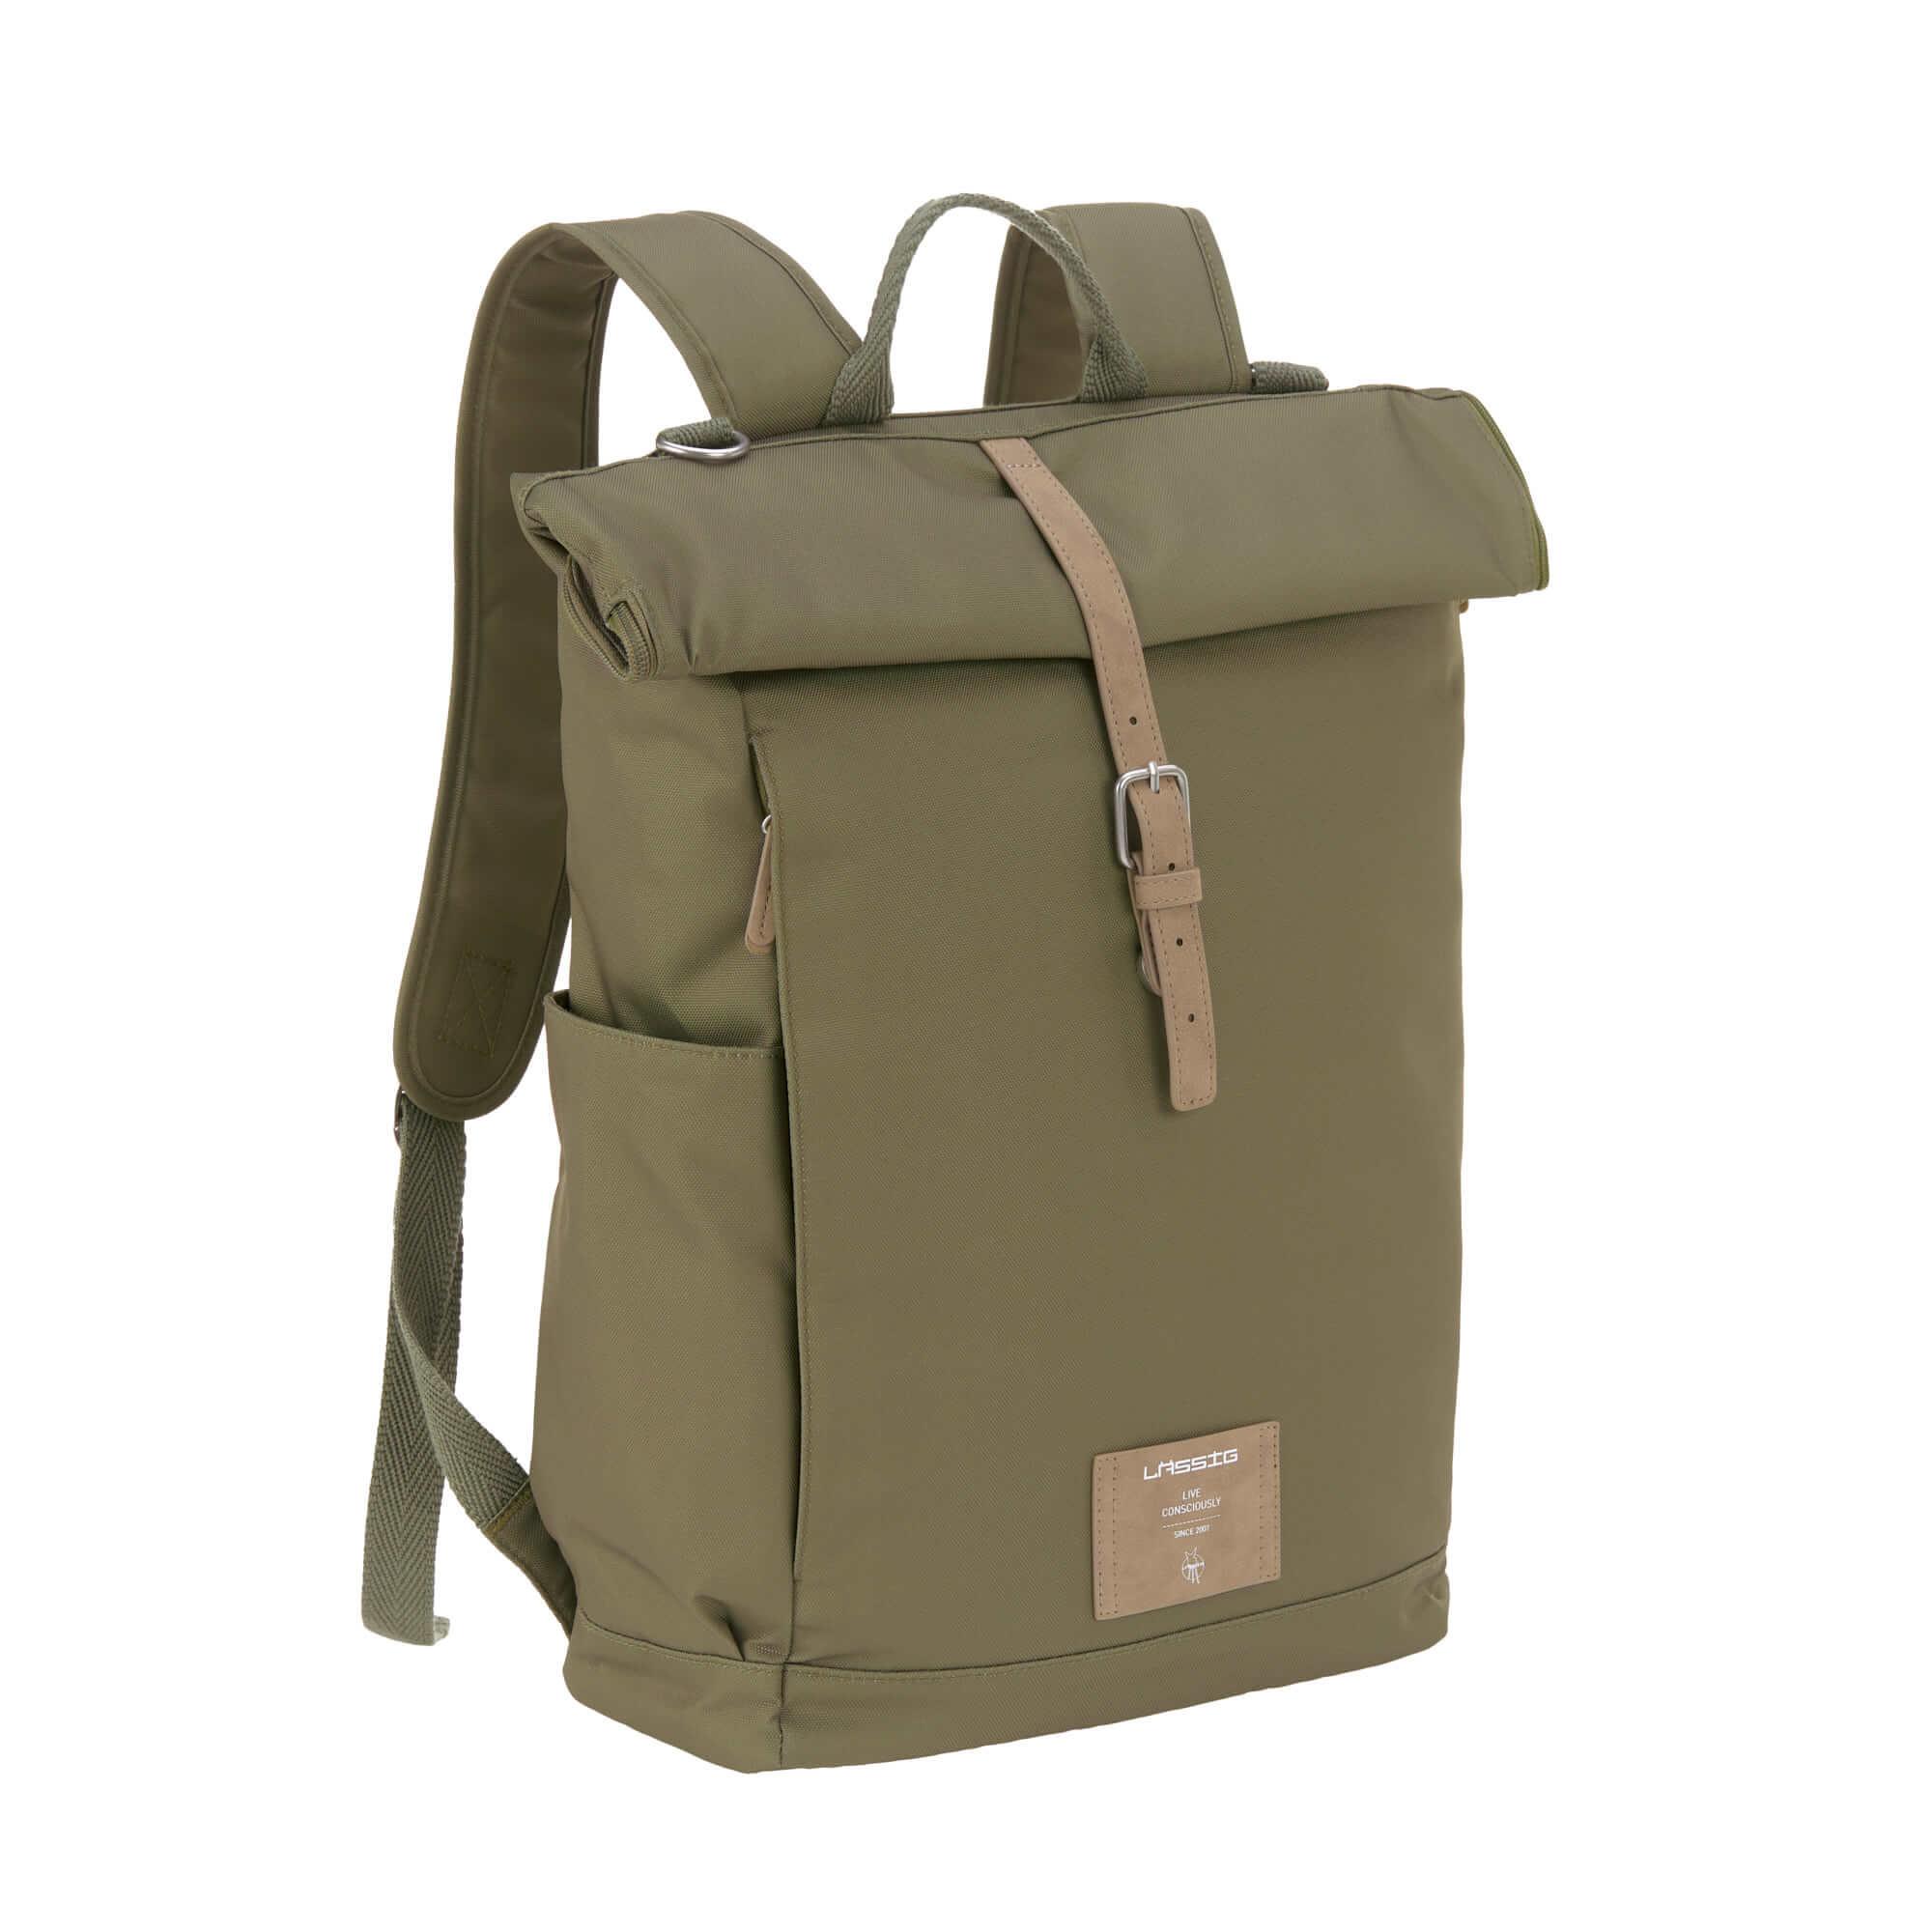 Lässig LÄSSIG Luiertas Rolltop Backpack incl. verschoningsmatje - olive